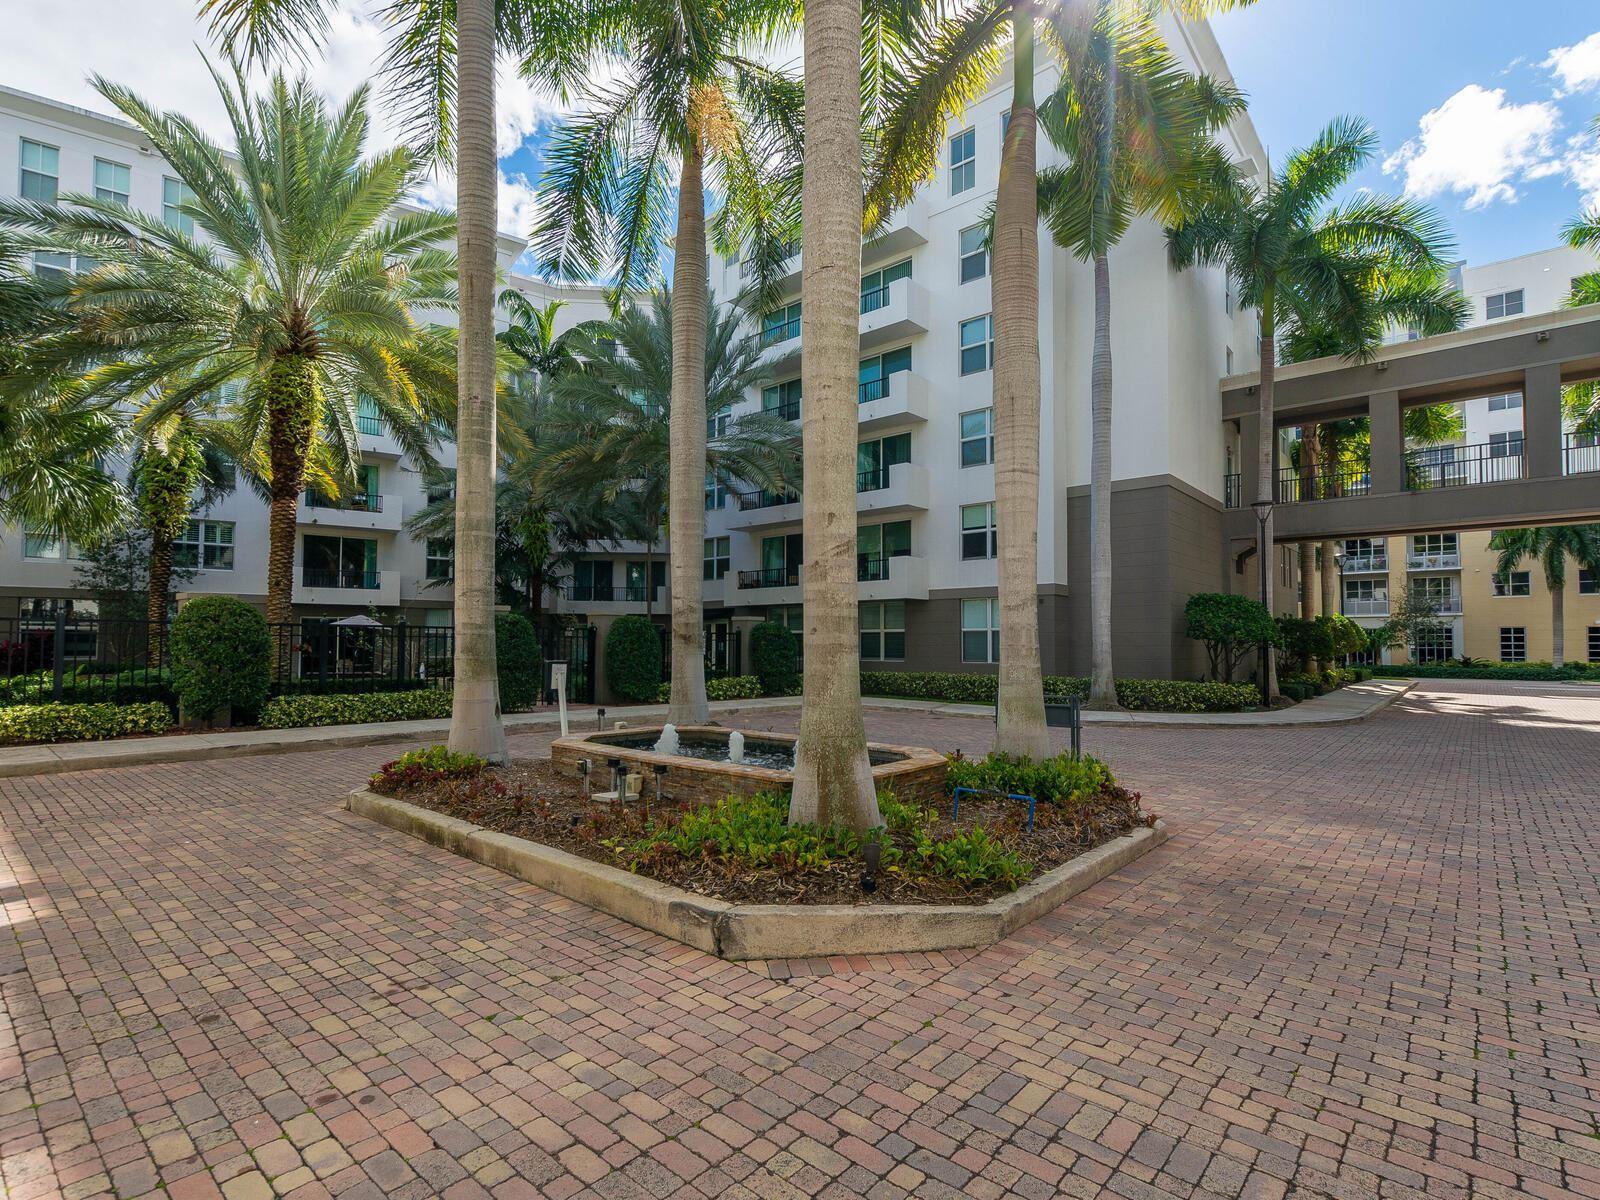 2421 NE 65th Street #2-410, Fort Lauderdale, FL 33308 - #: RX-10686679